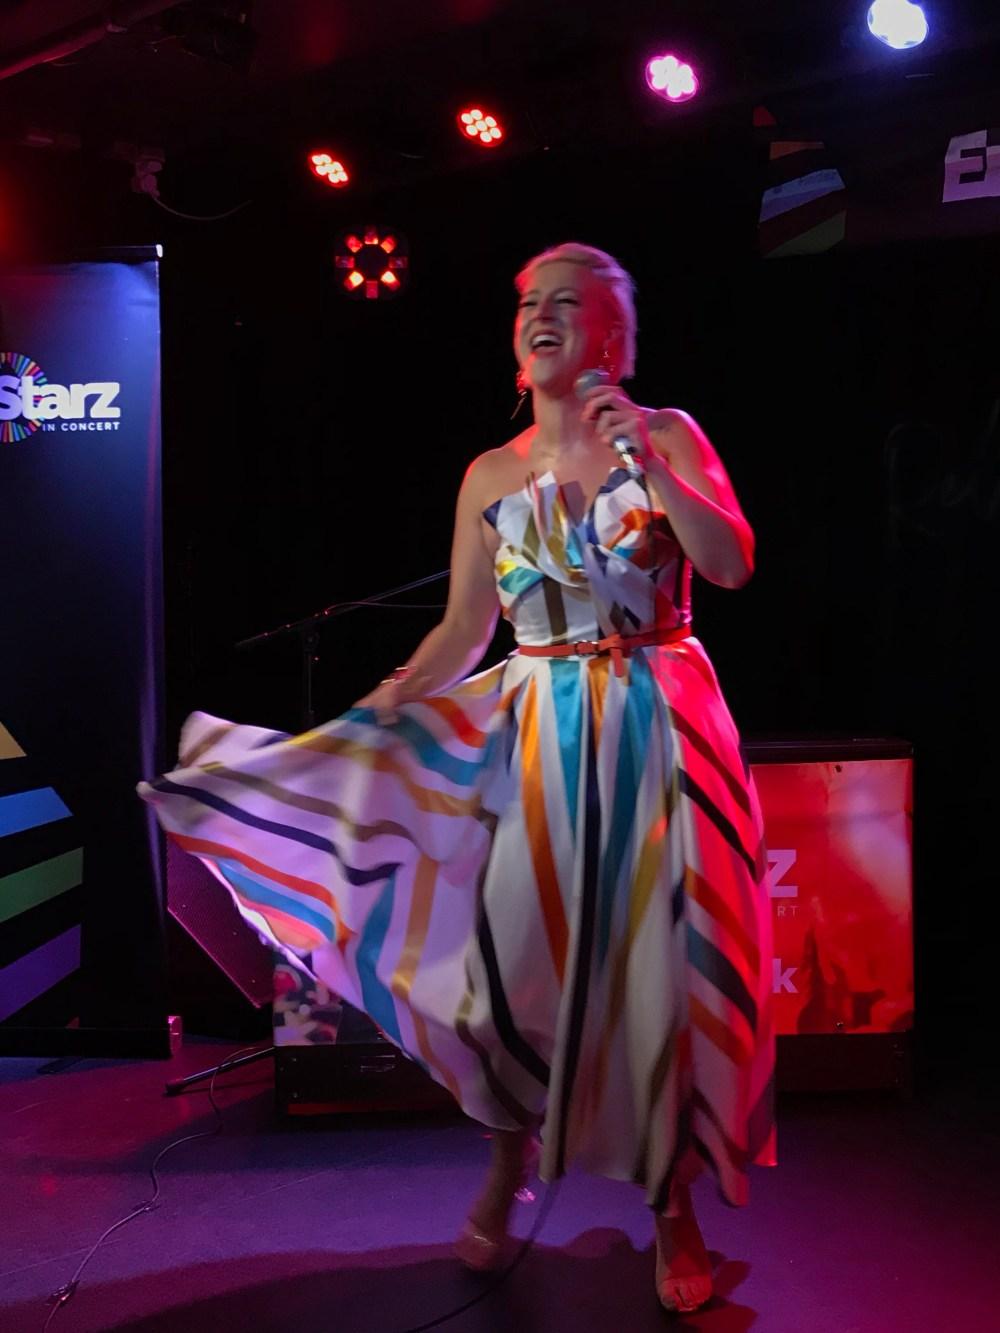 Lindsey Dracass at EuroStarz in Concert 2018